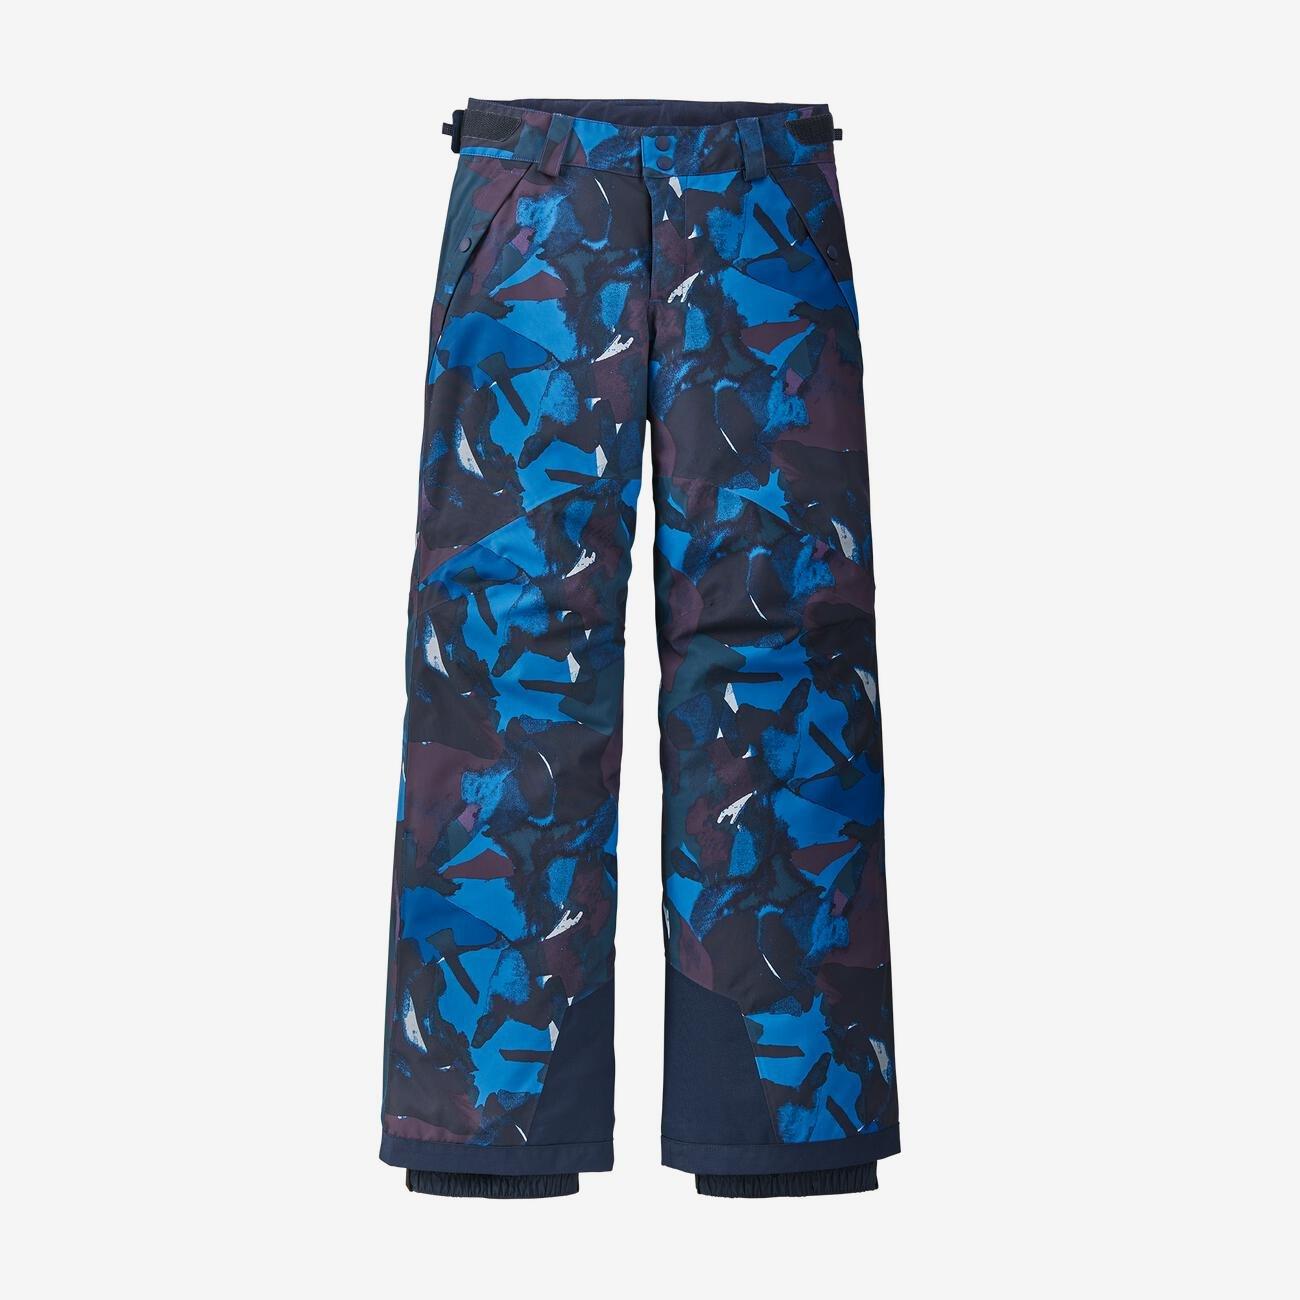 Patagonia Boys' Everyday Ready Pants